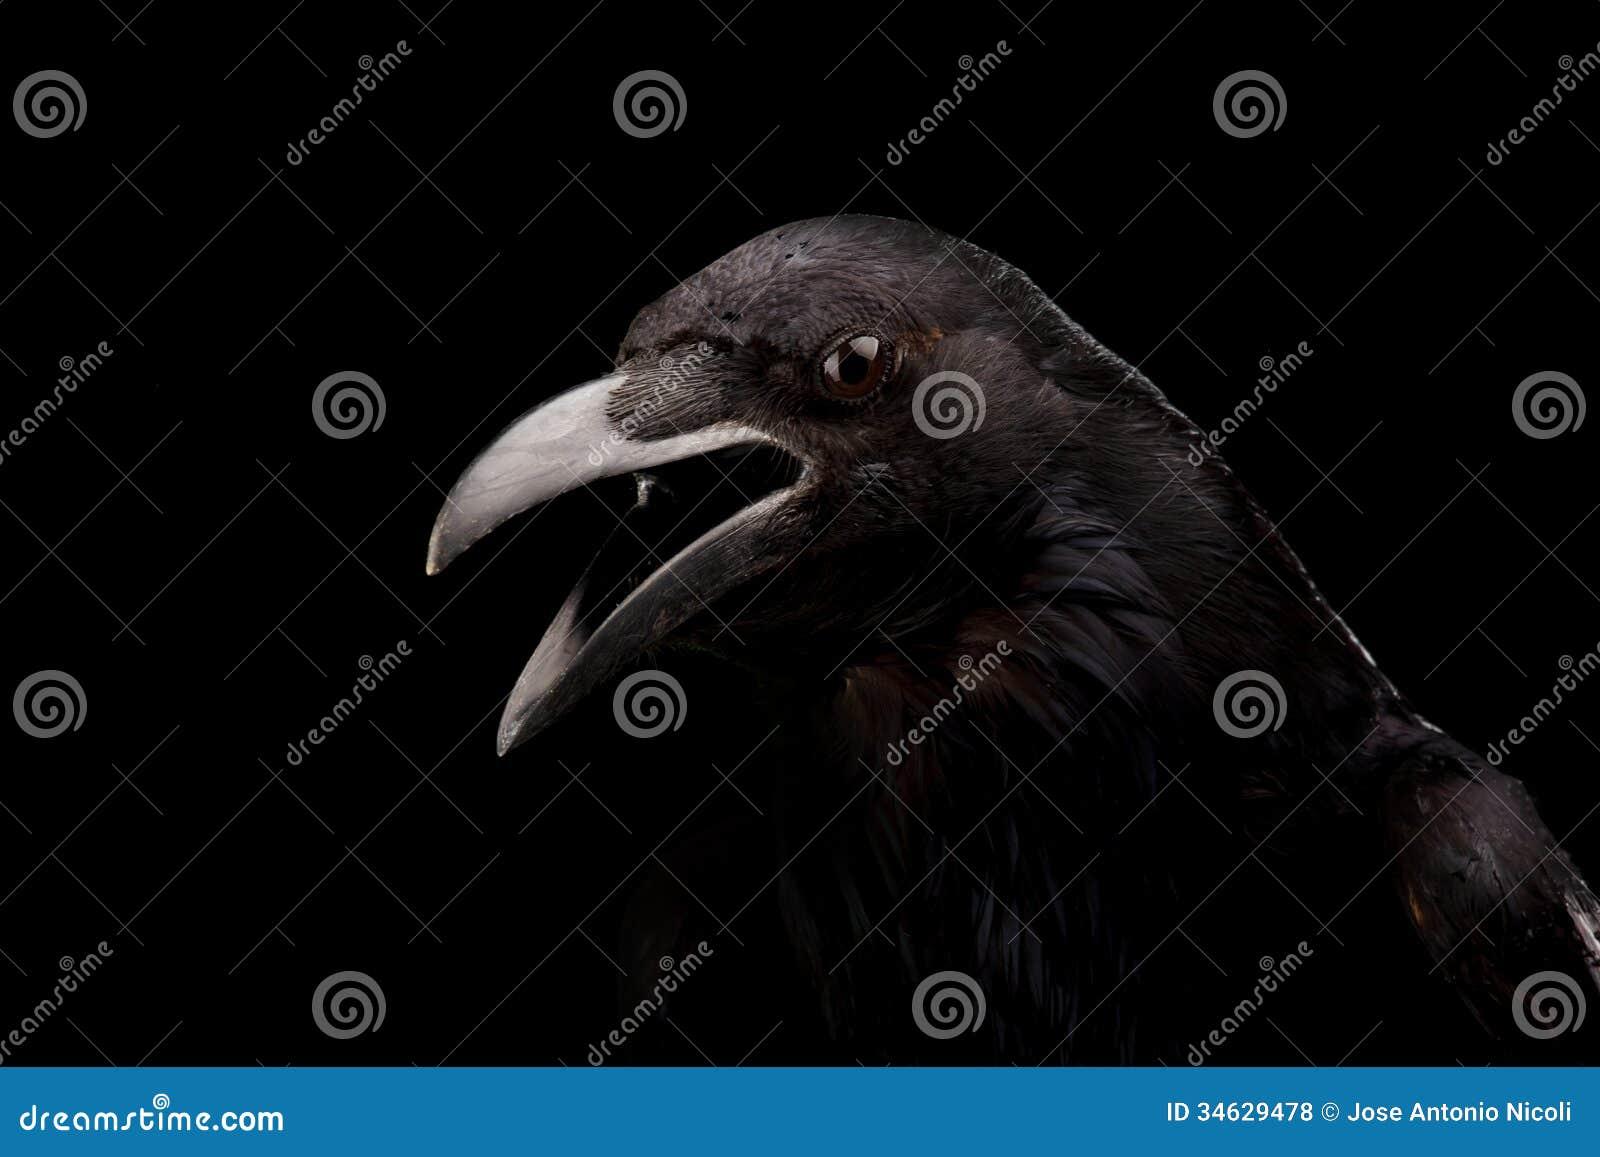 Svart galande i svart